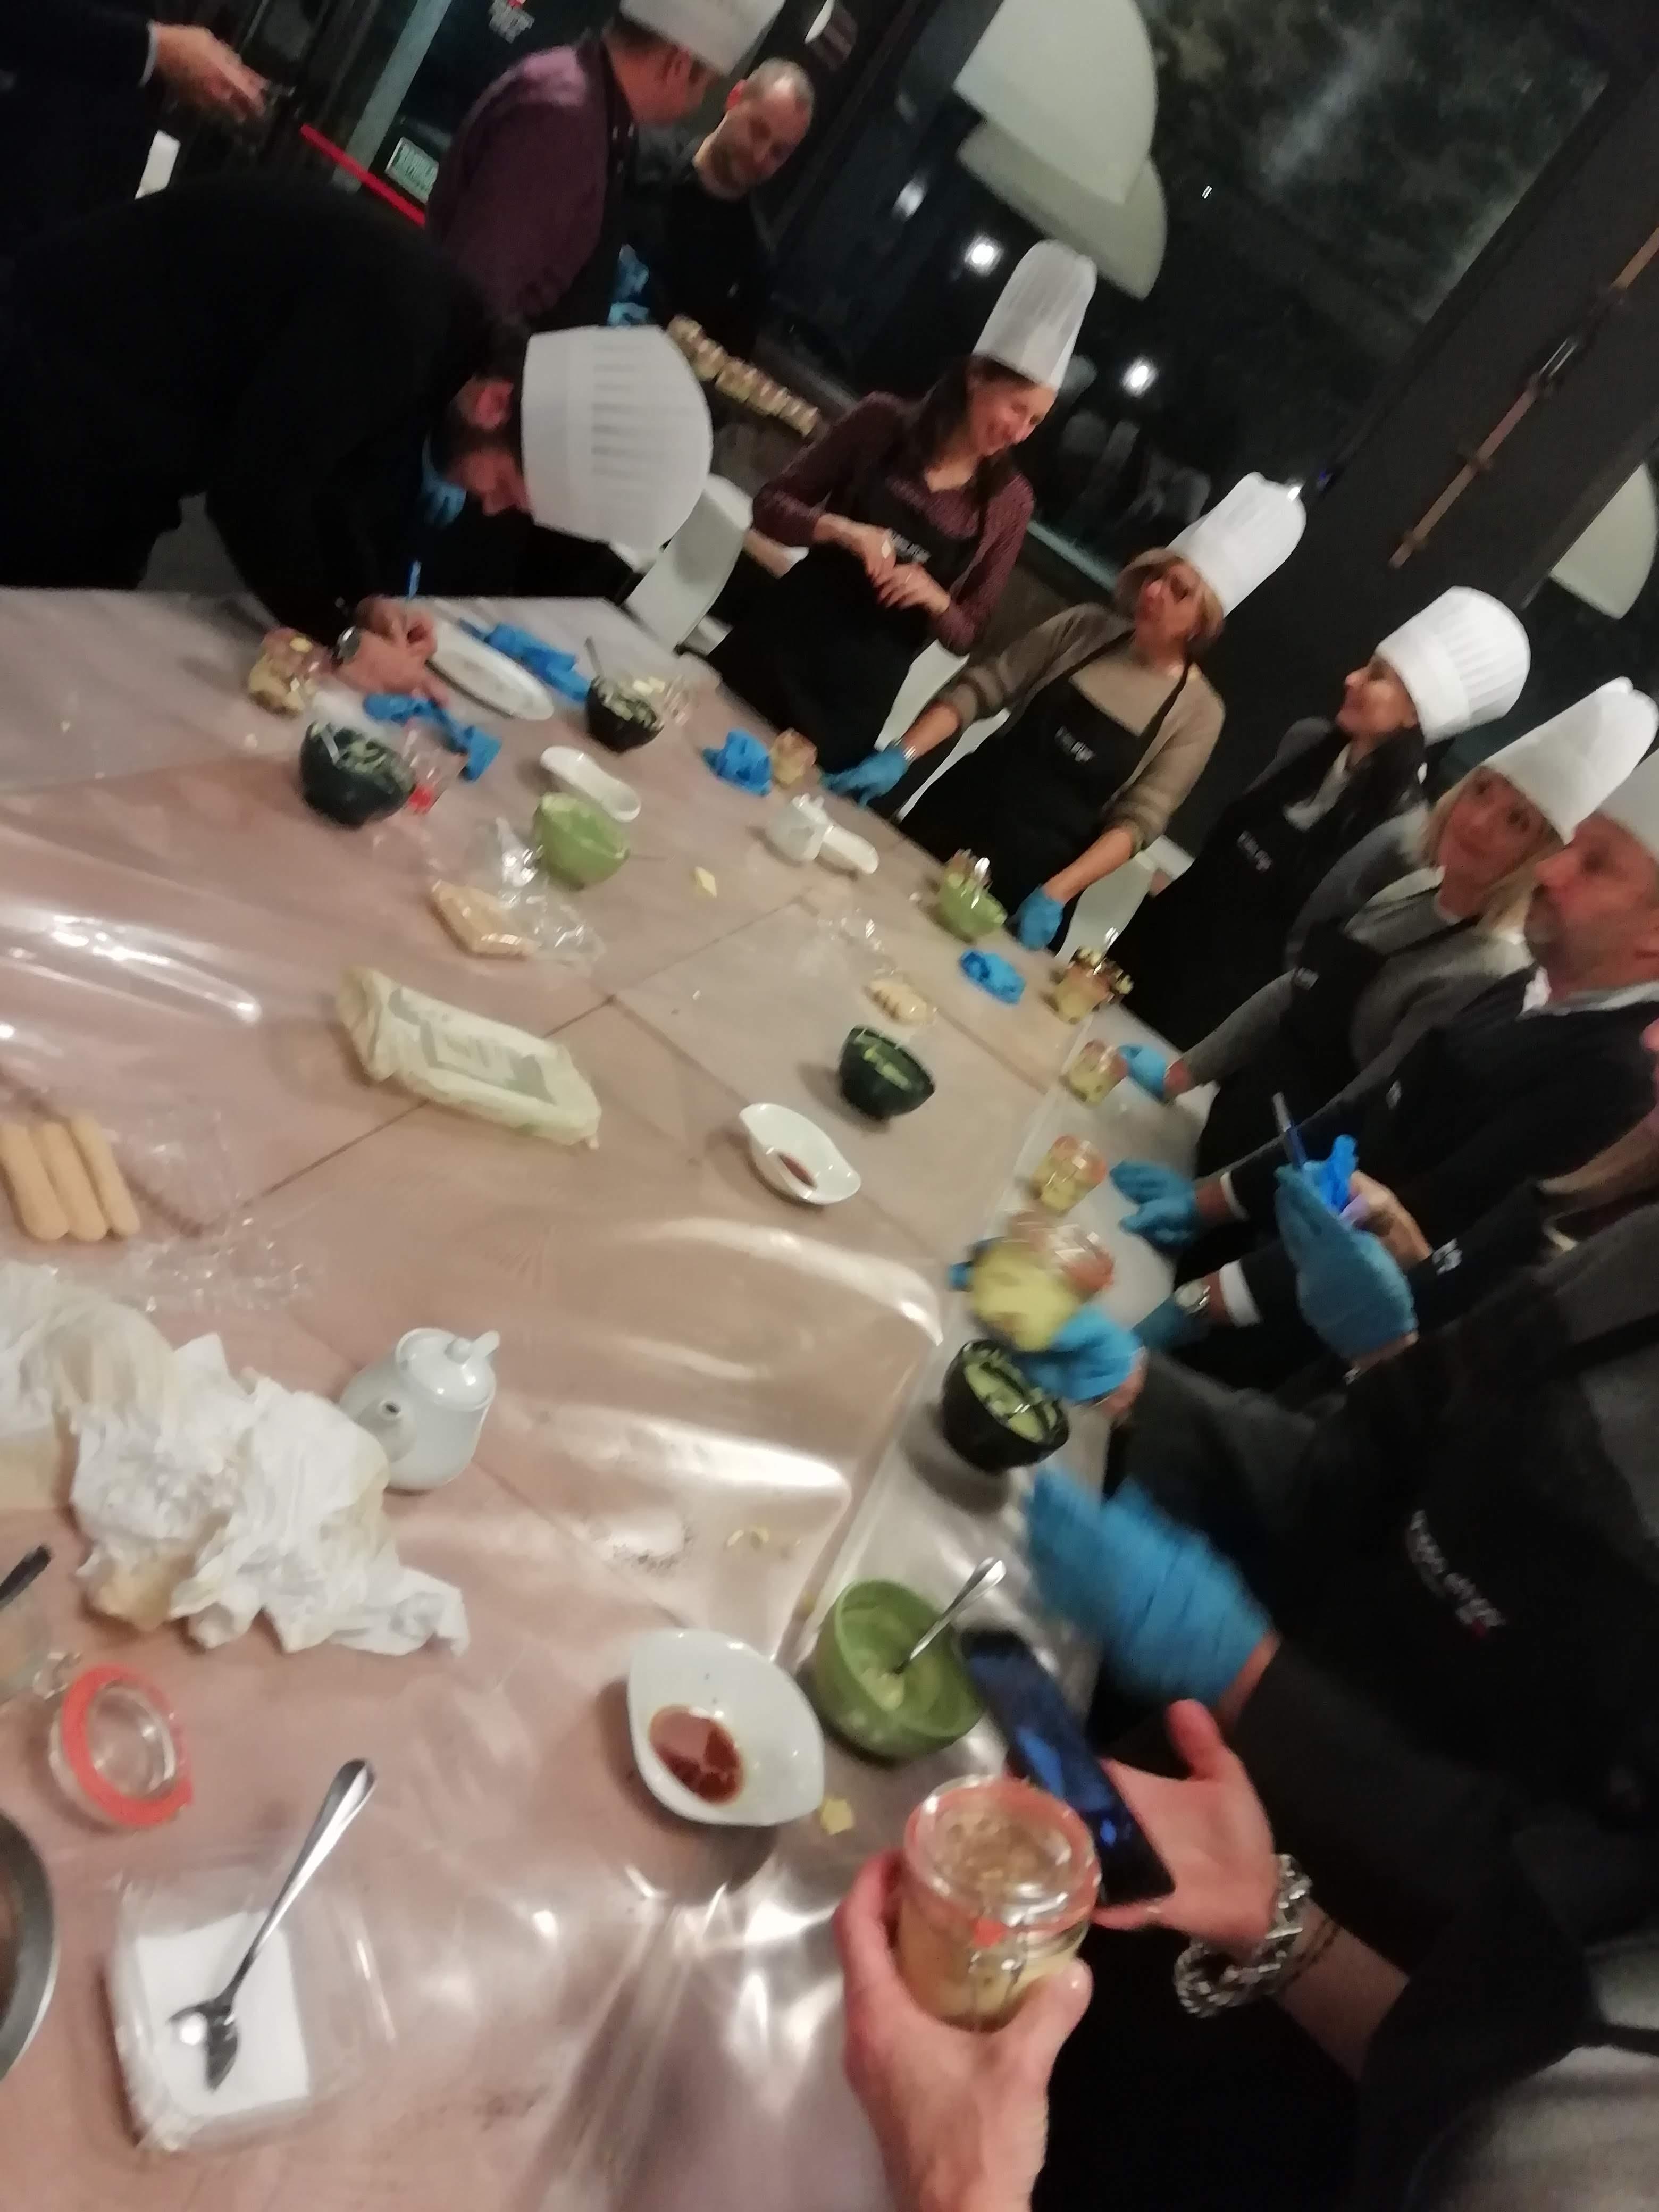 Team building aziendale Loro Piana a Grani e Braci - Cook, eat and Learn